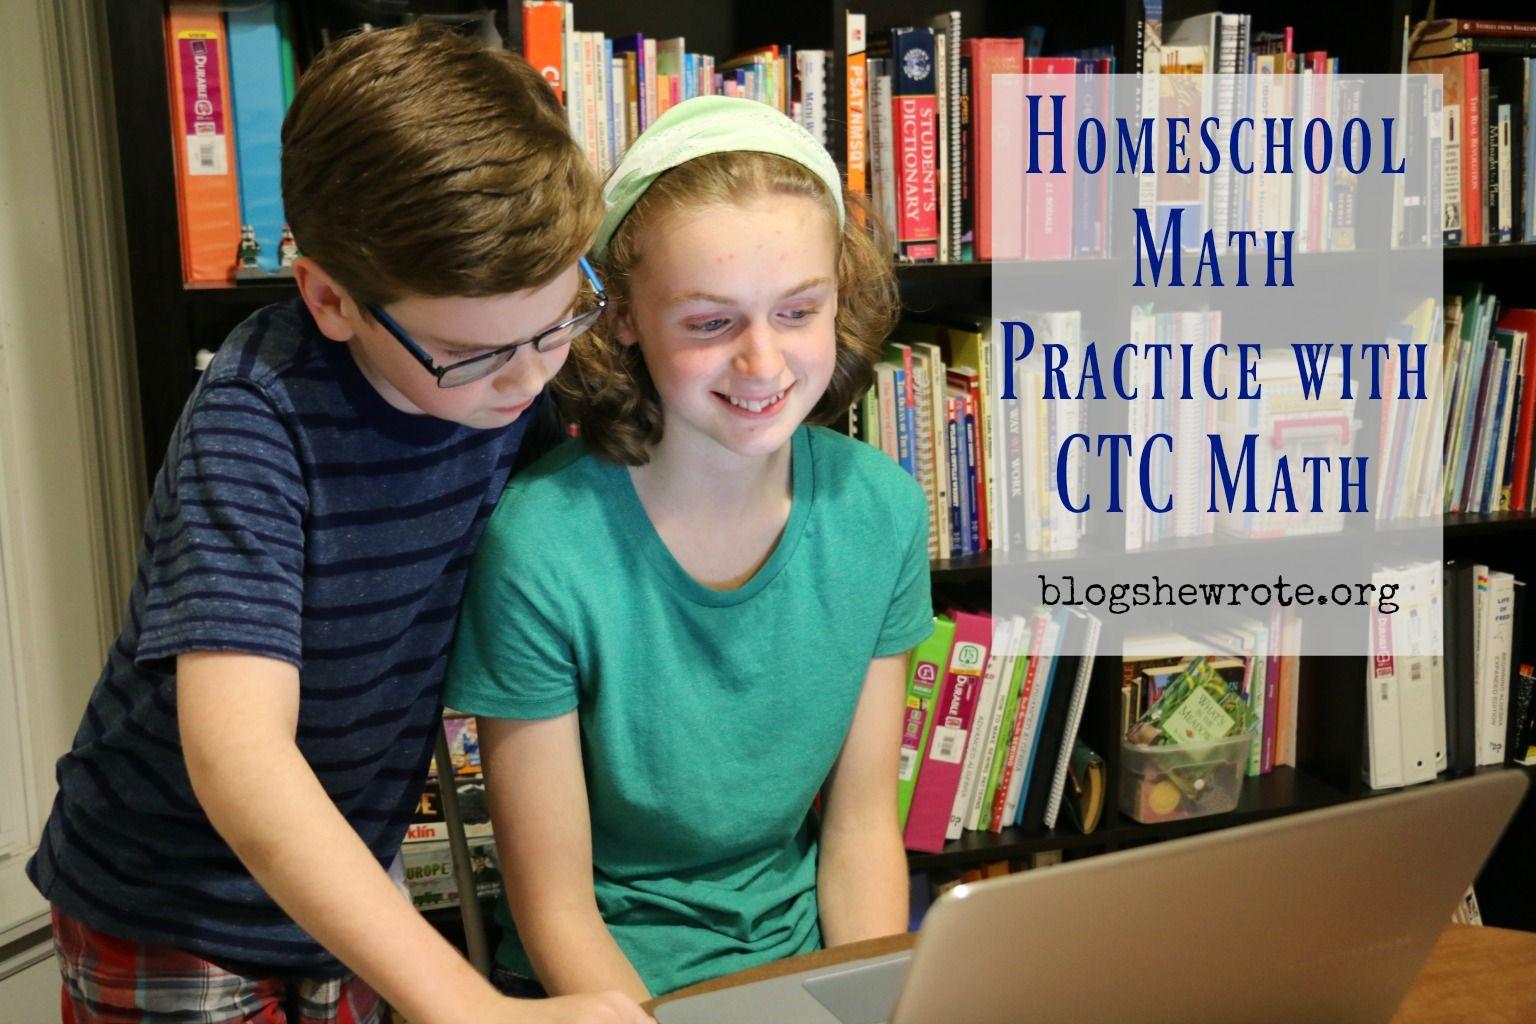 Homeschool Math Practice with CTC Math | Reviews | Pinterest ...